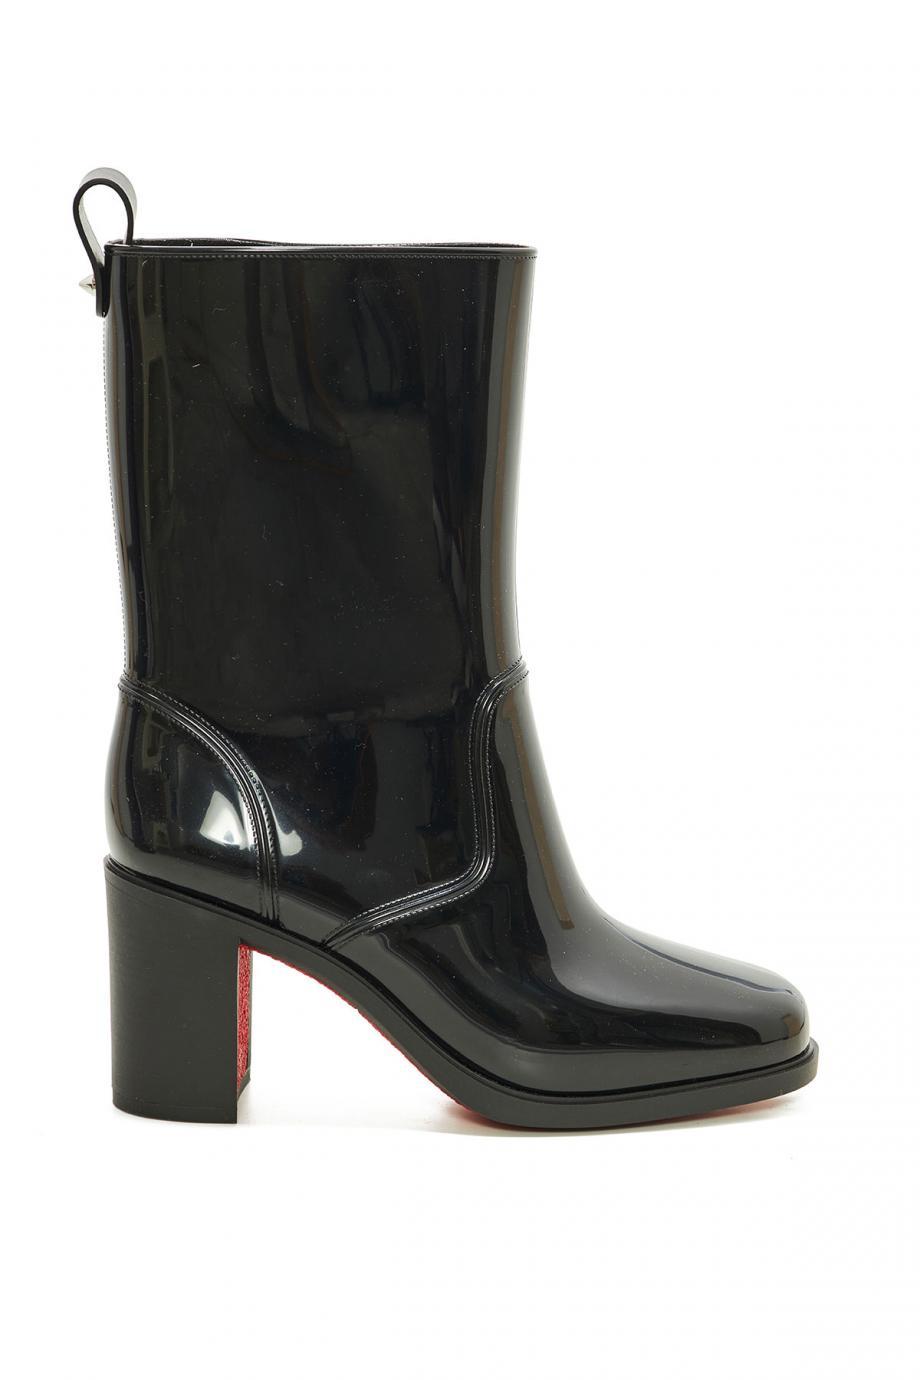 Loubirain PVC boots